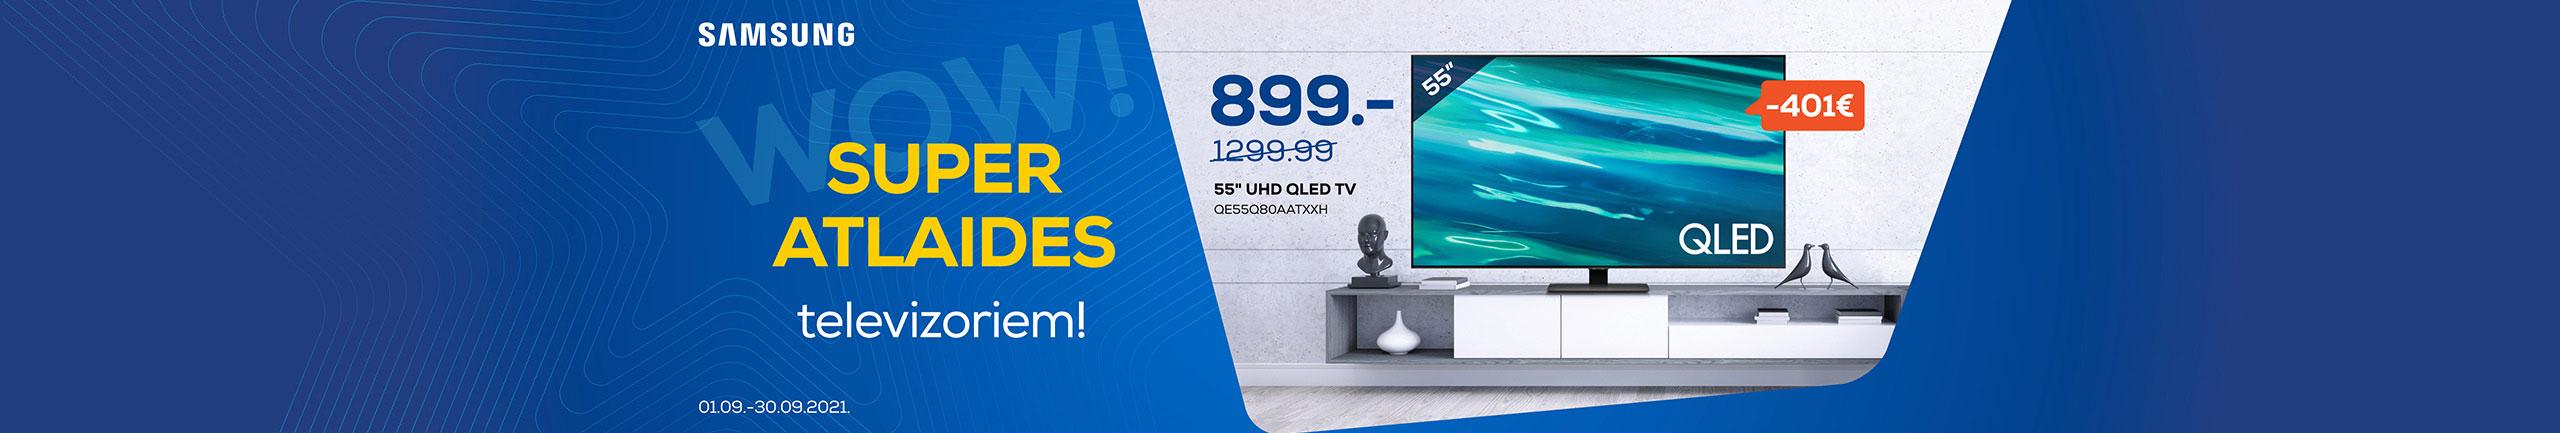 GR Samsung TV